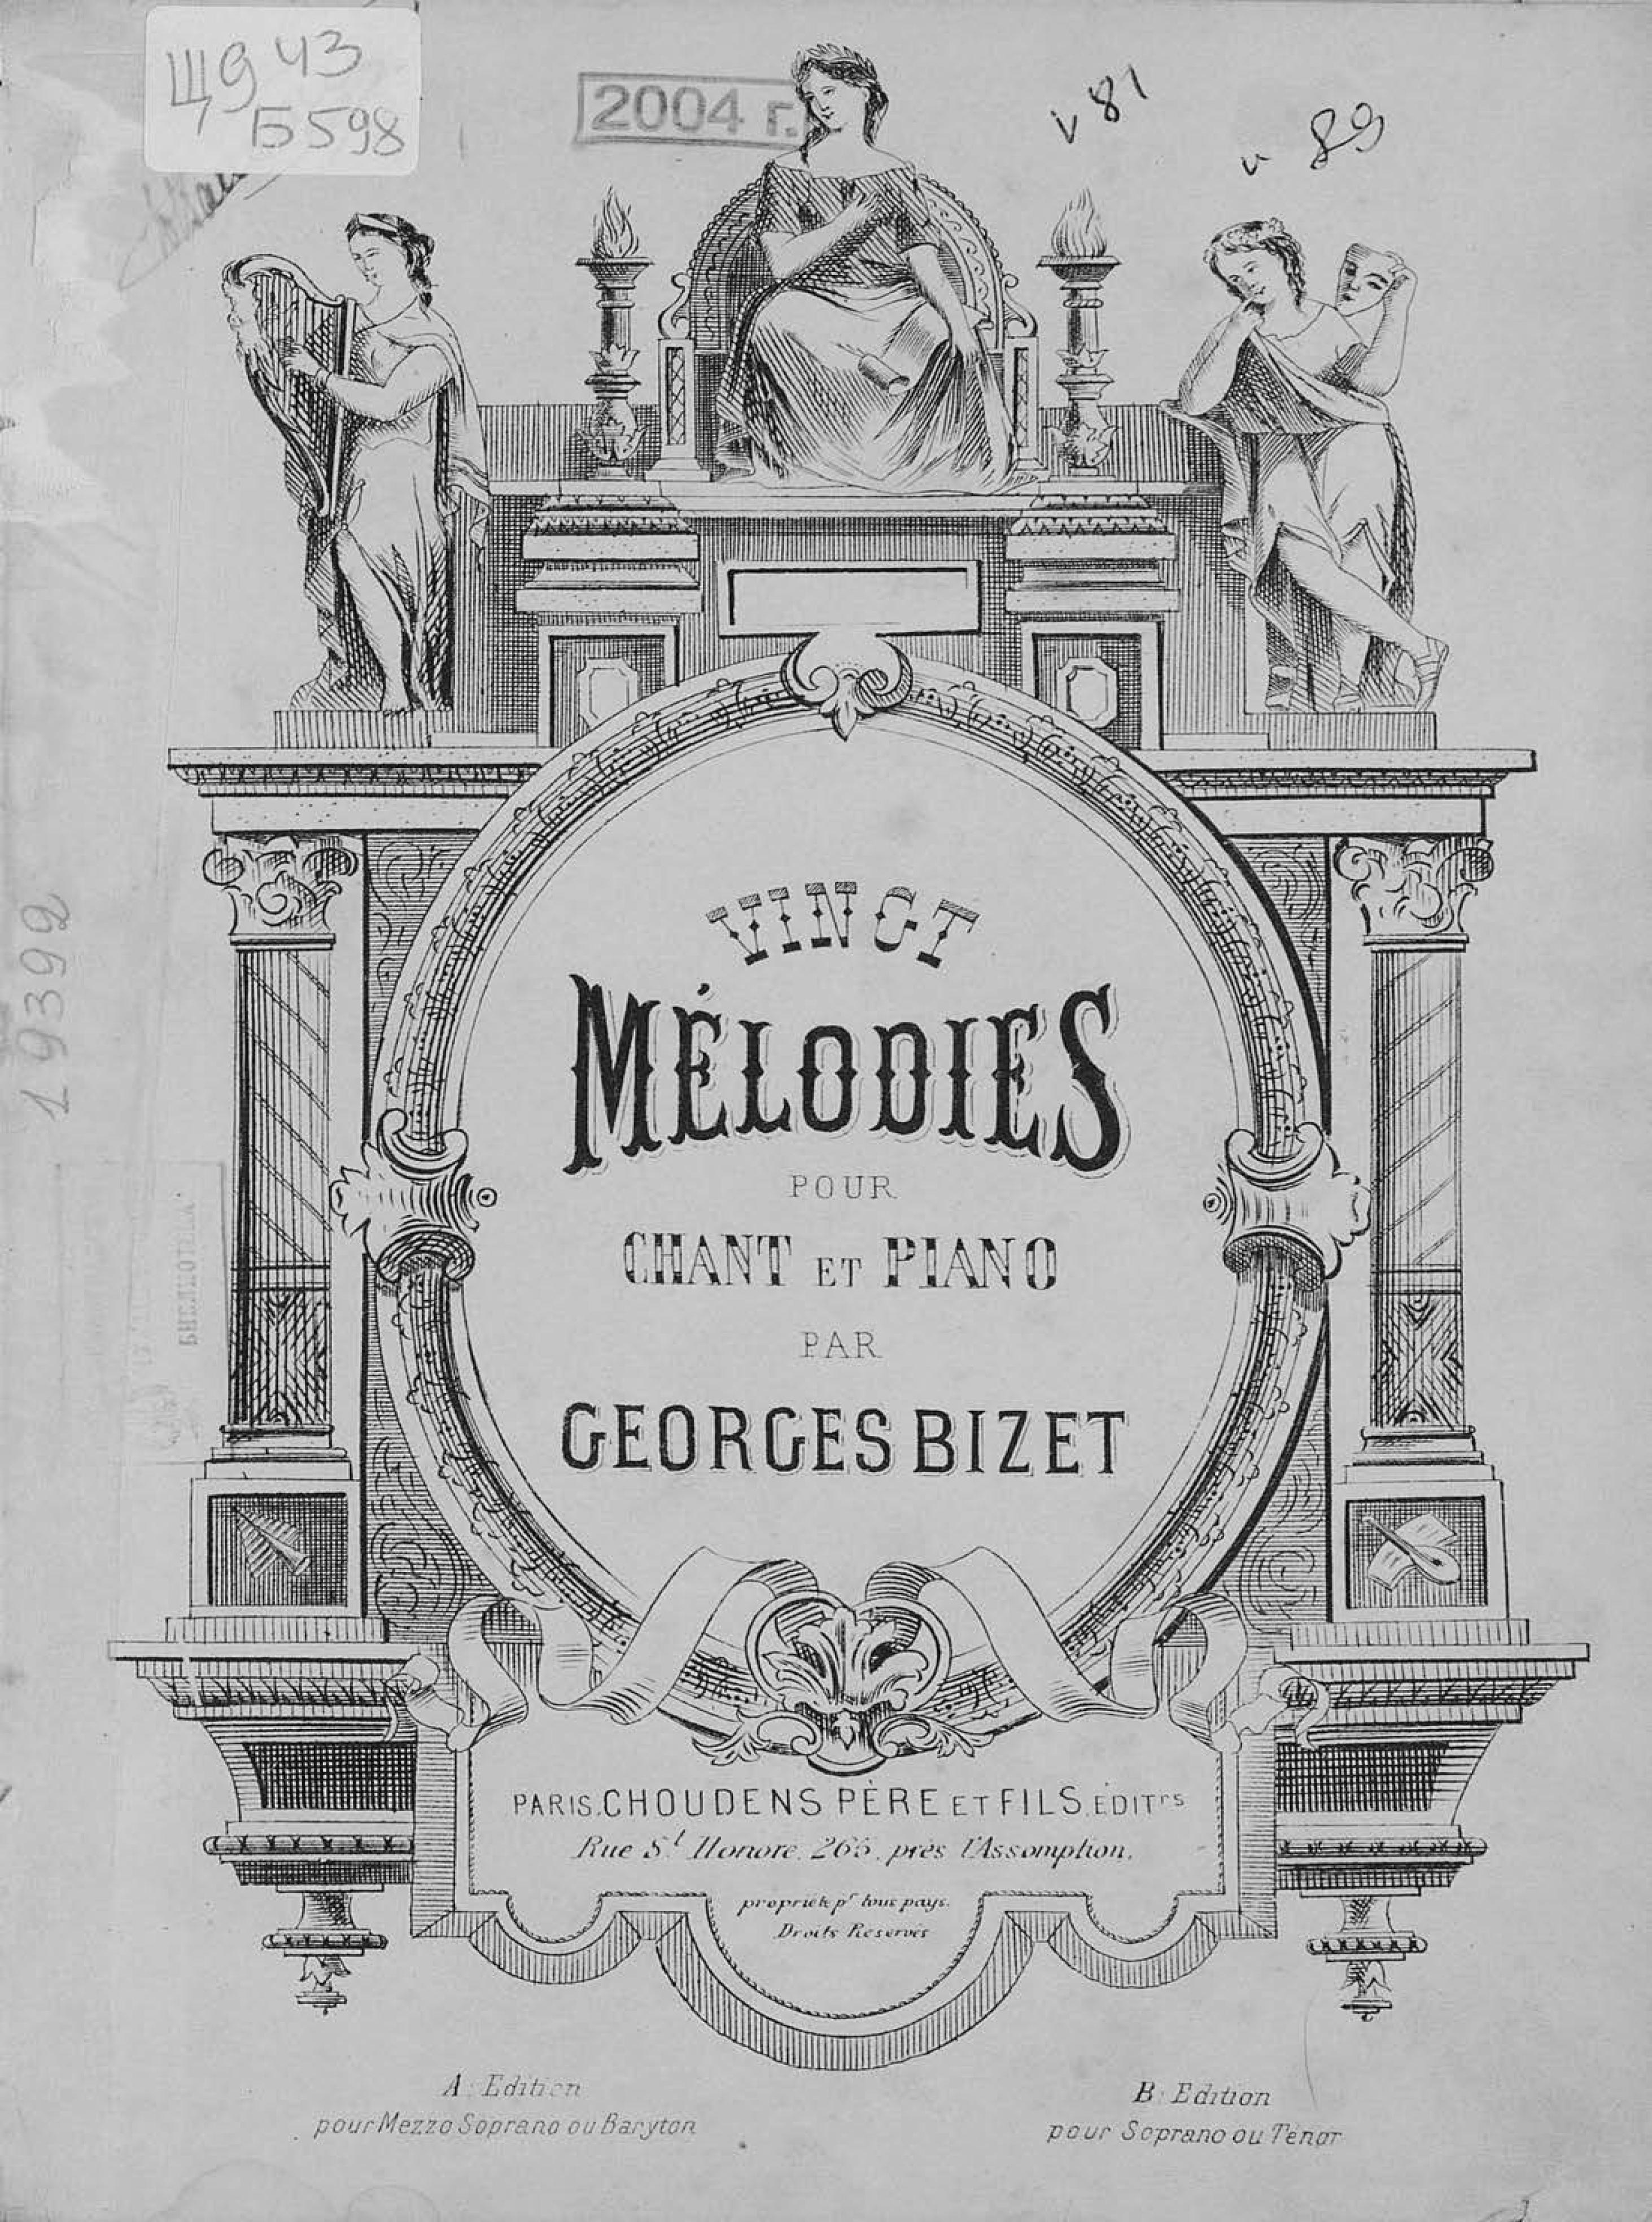 Жорж Бизе Vingt melodies pour chant et piano габриель урбен форе vingt melodies pour chant et piano par gabriel faure